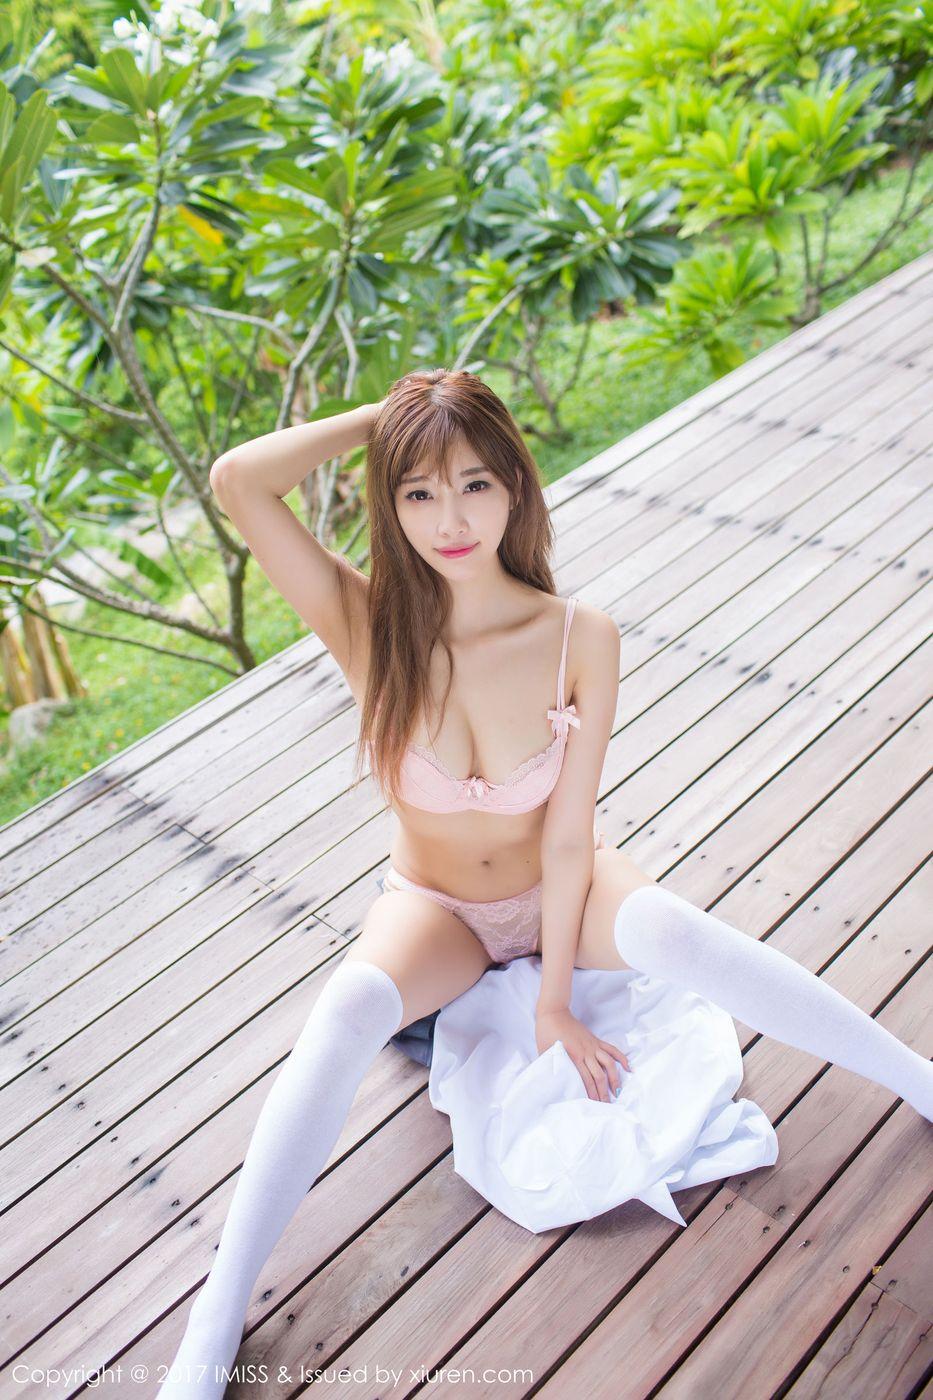 [IMiss爱蜜社] 甜美女神杨晨晨sugar室外校服内衣制服诱惑苏梅岛旅拍